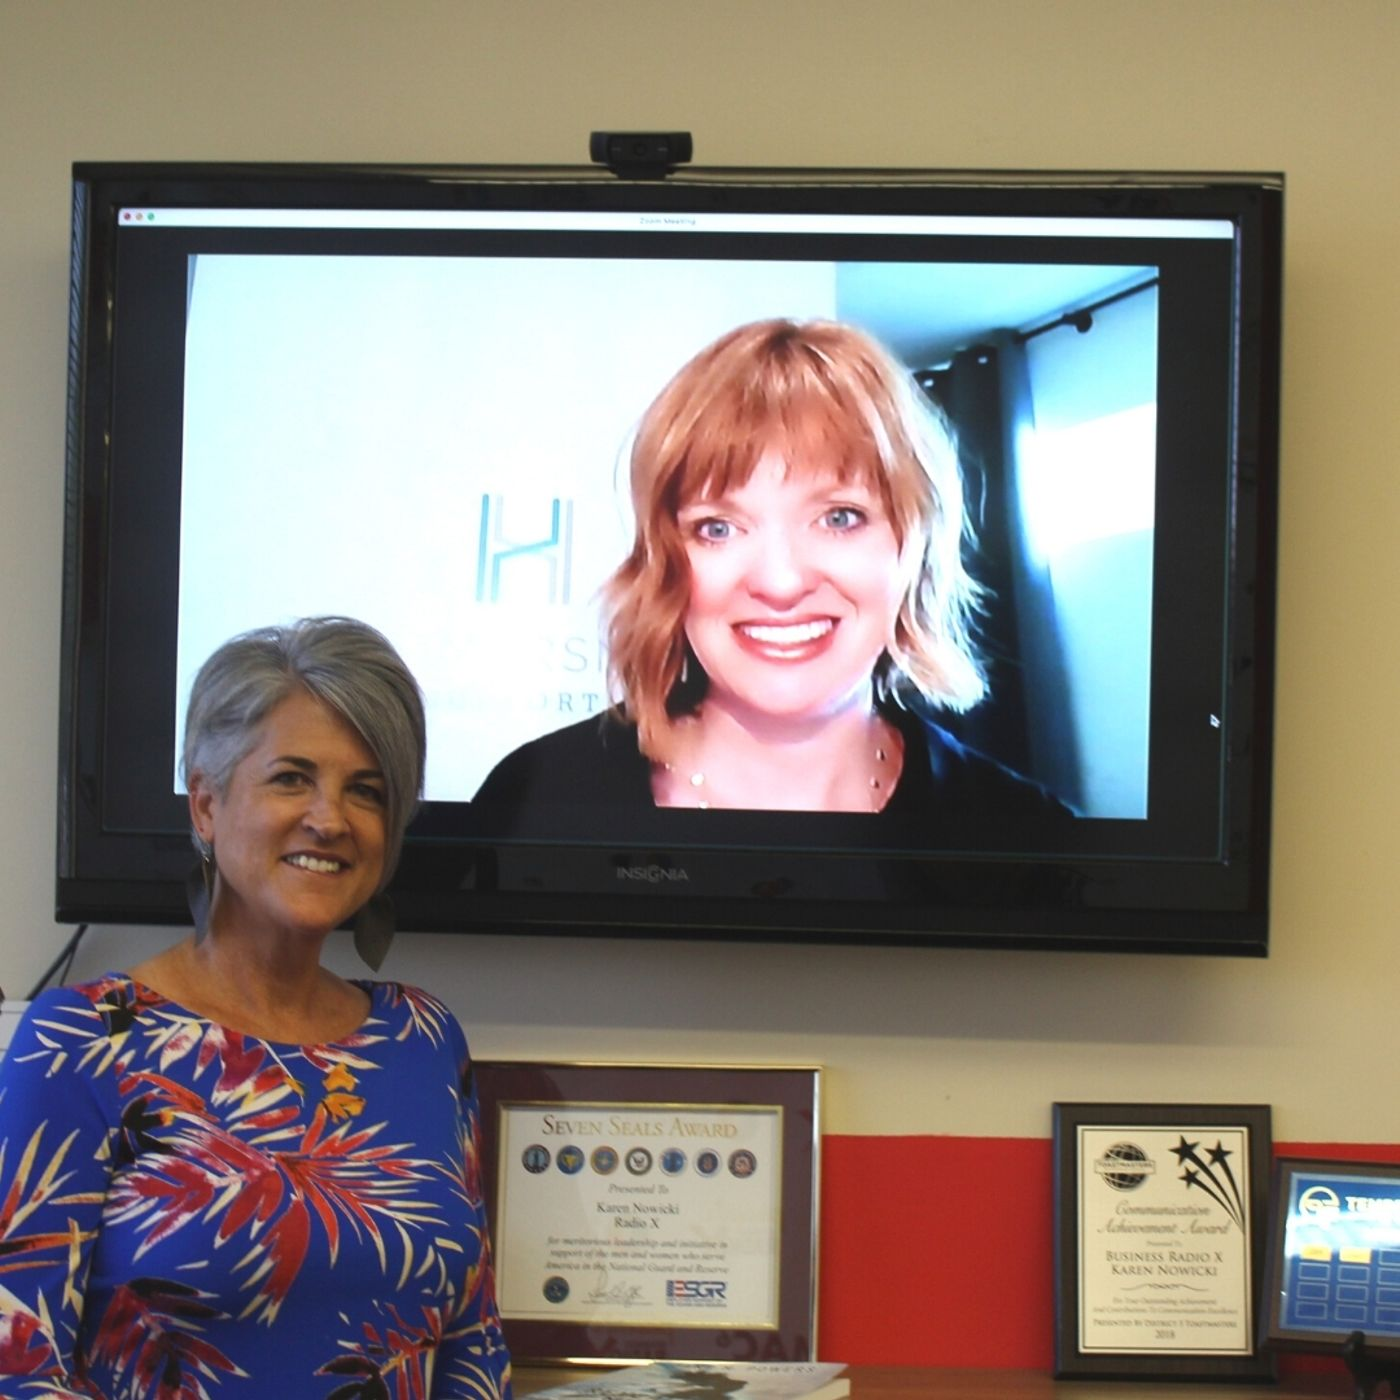 Heather Locke with Hammersmith Support